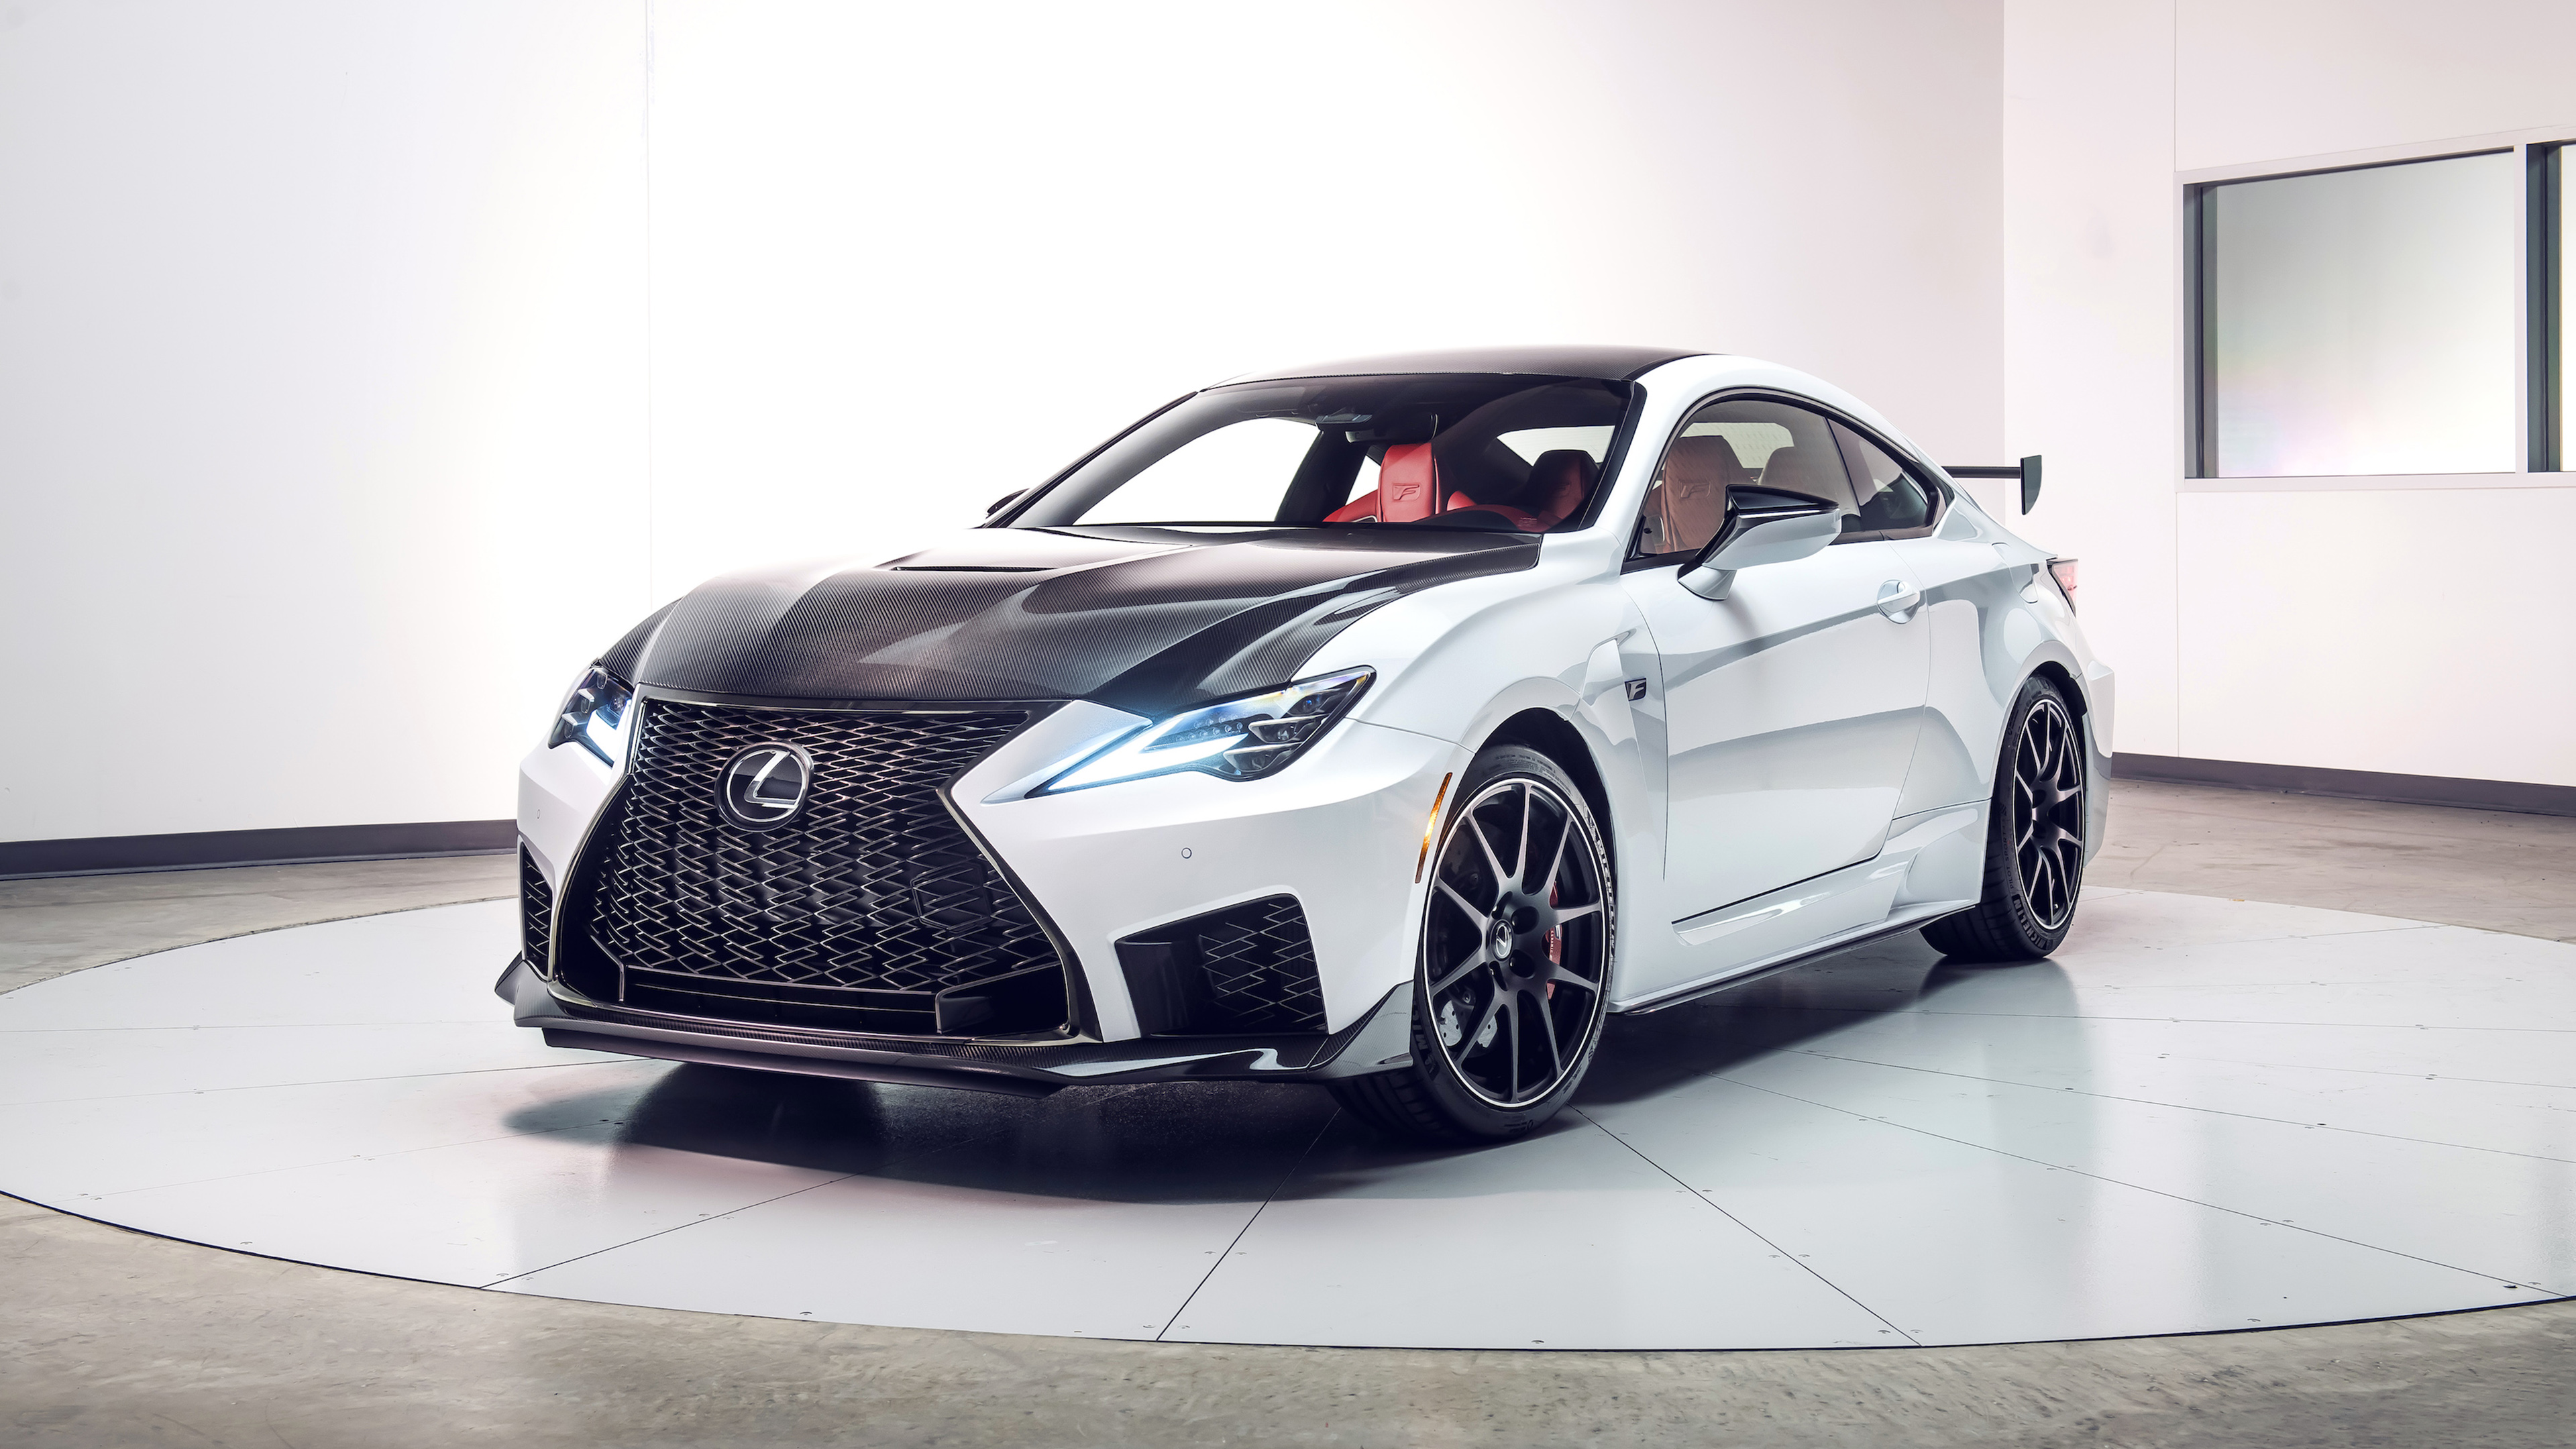 2020 Lexus Rc F Track Edition 4k Wallpaper Hd Car Wallpapers Id 11902